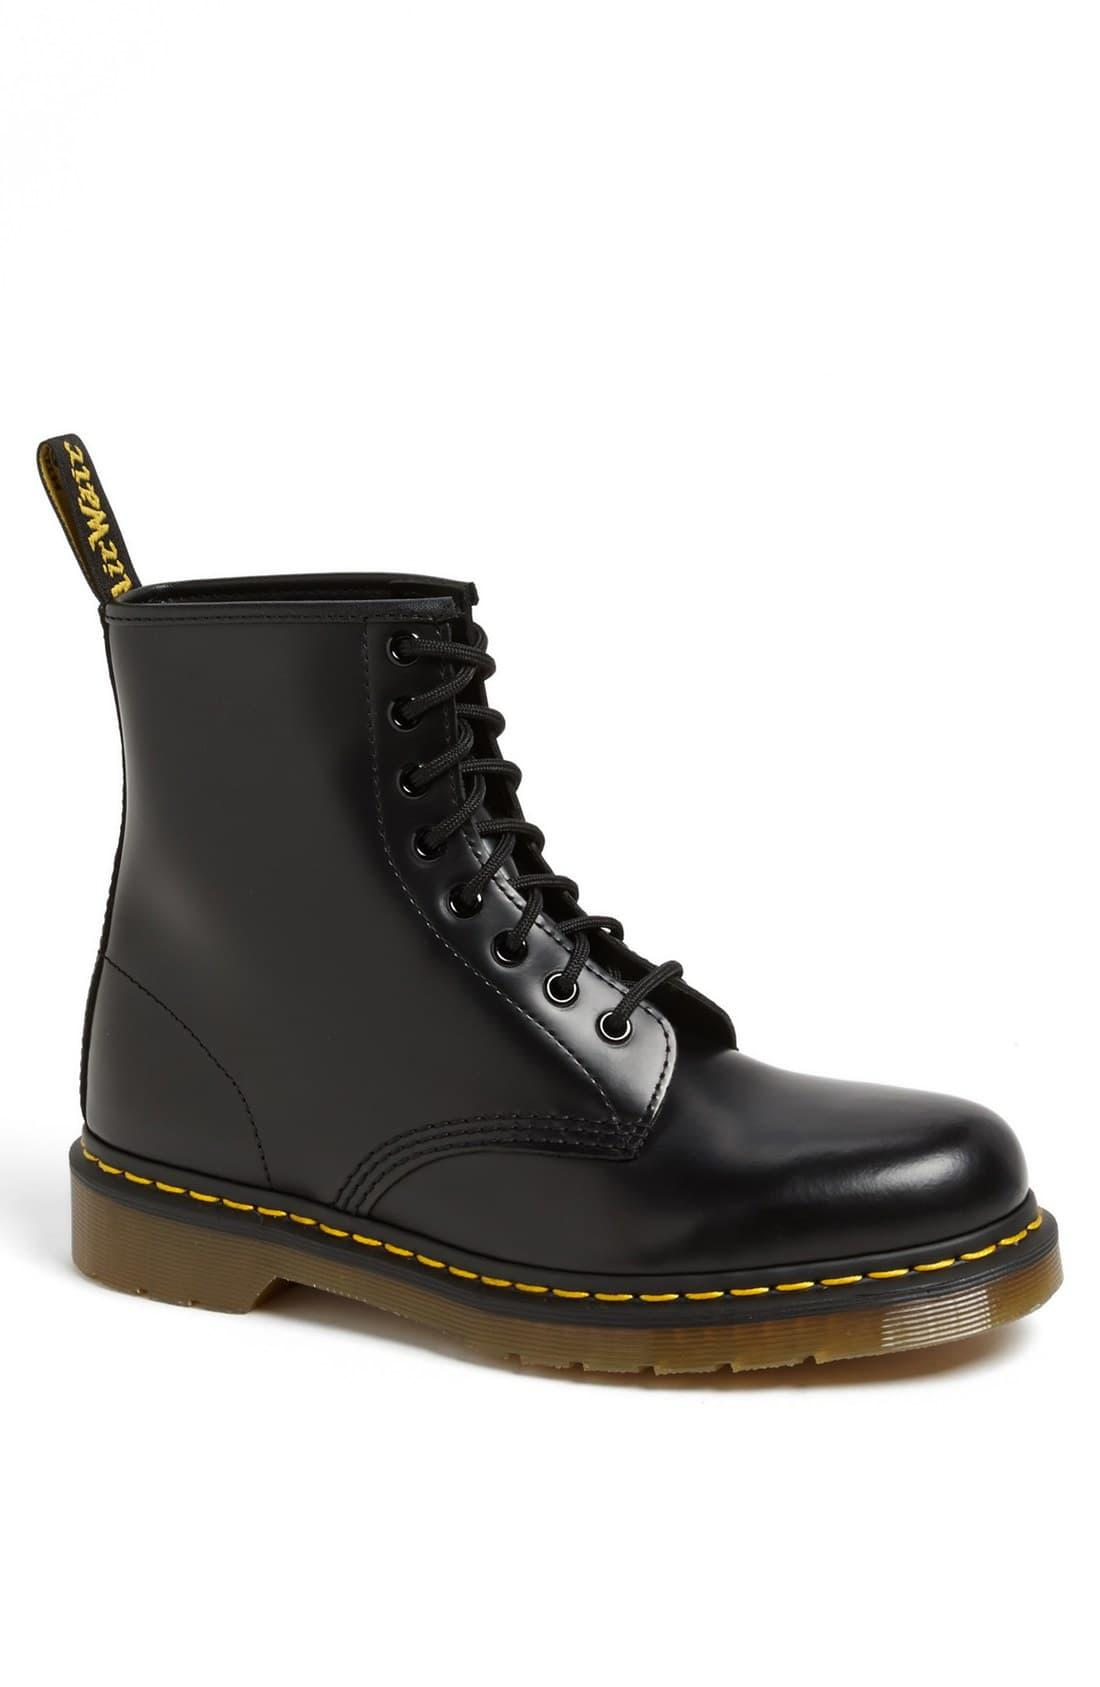 https://cdna.lystit.com/photos/nordstrom/6786a825/dr-martens-Black-Smooth-1460-Boot.jpeg